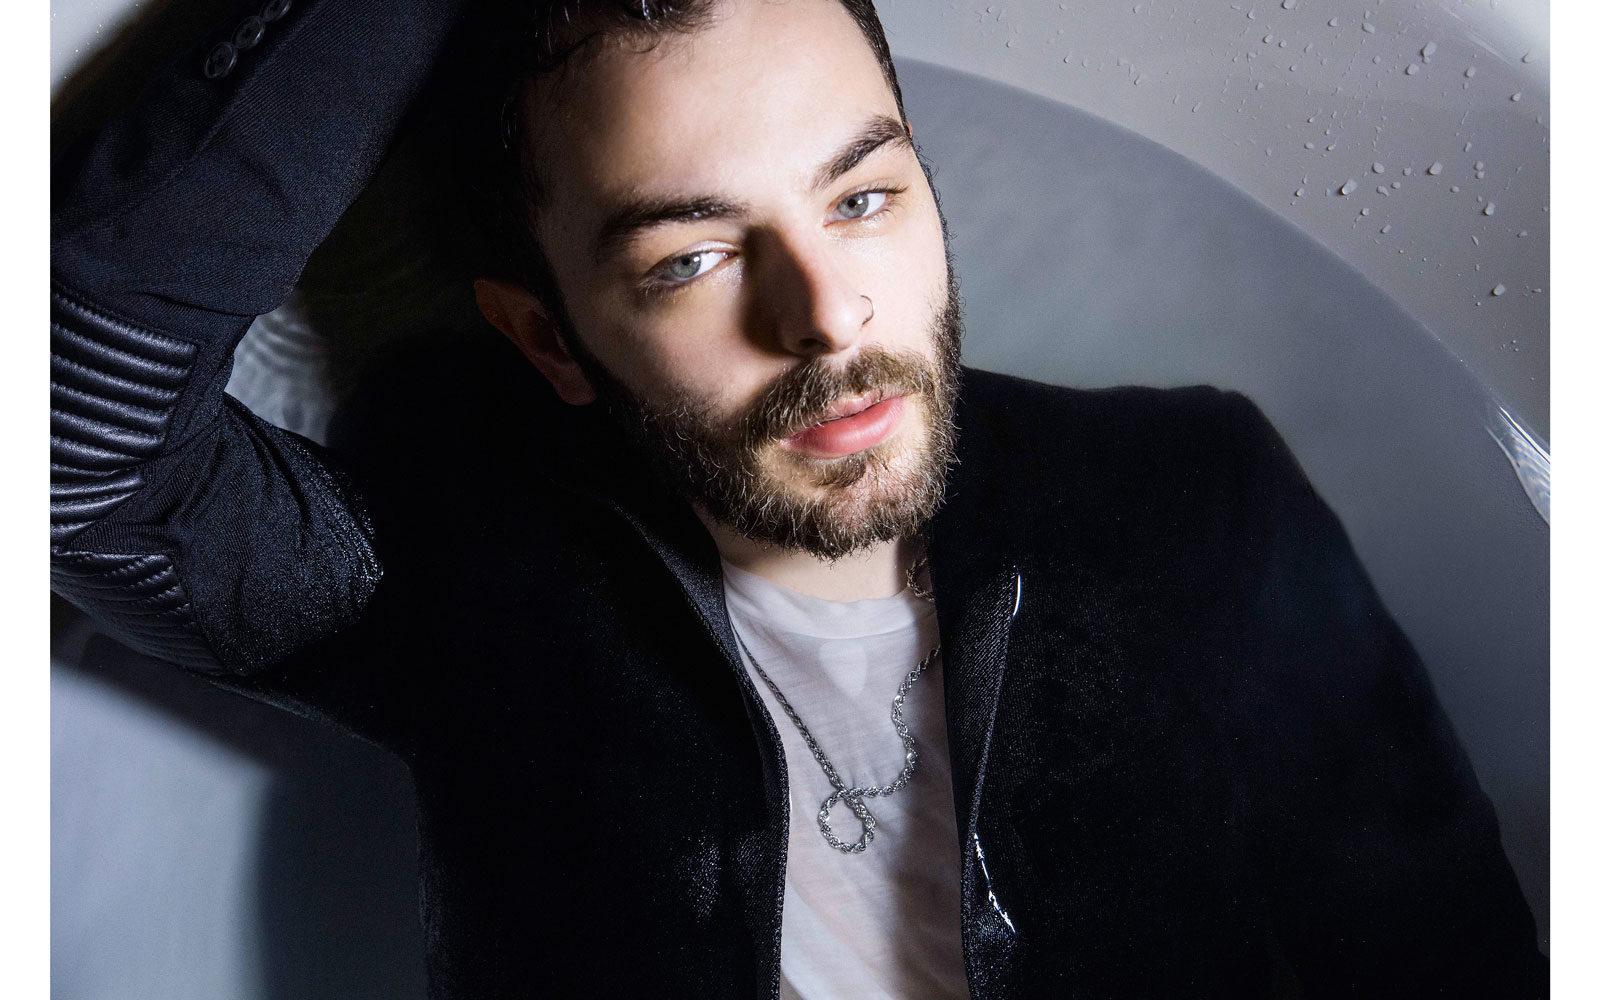 Lorenzo Fragola (credit: Chiara Mirelli)